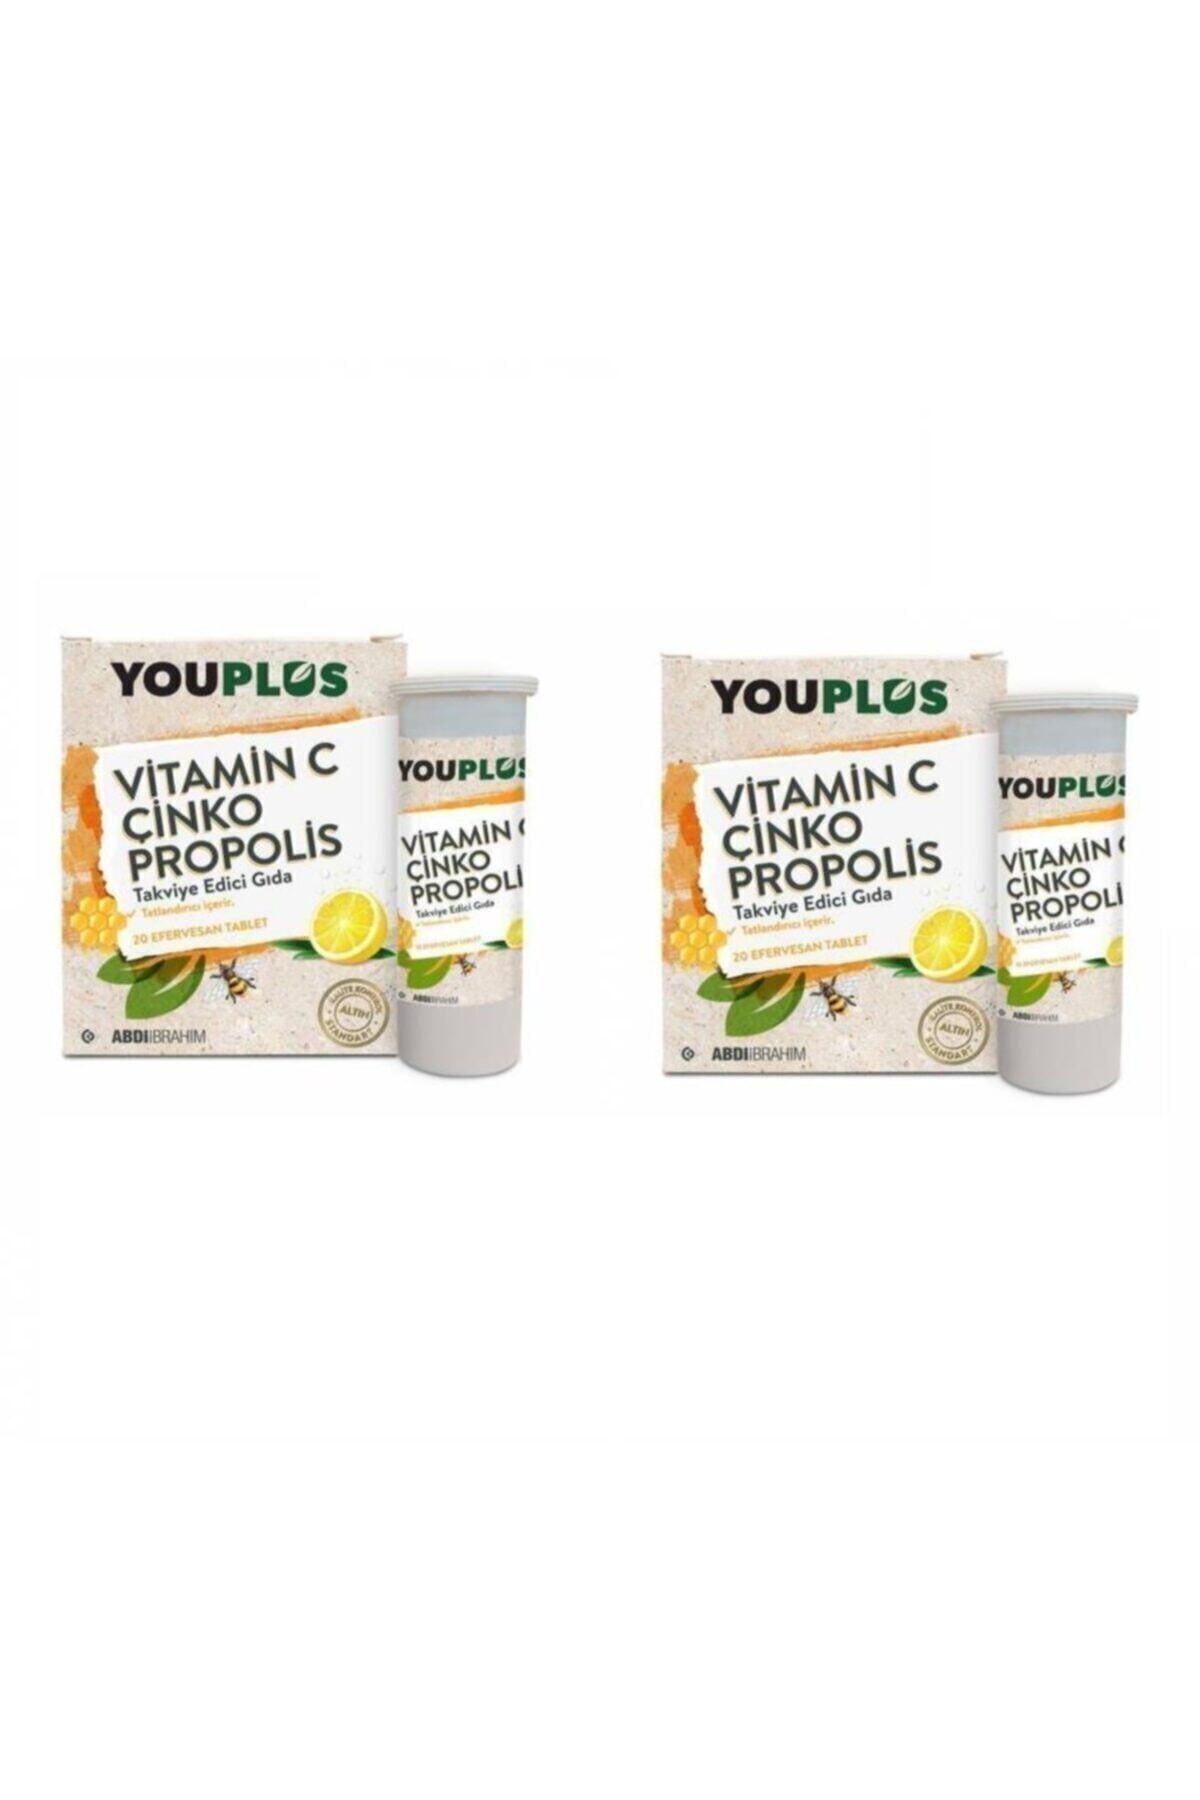 Youplus Kontrol - Vitamin C Çinko Propolis 20 Efervesan Tablet 2 Paket 1